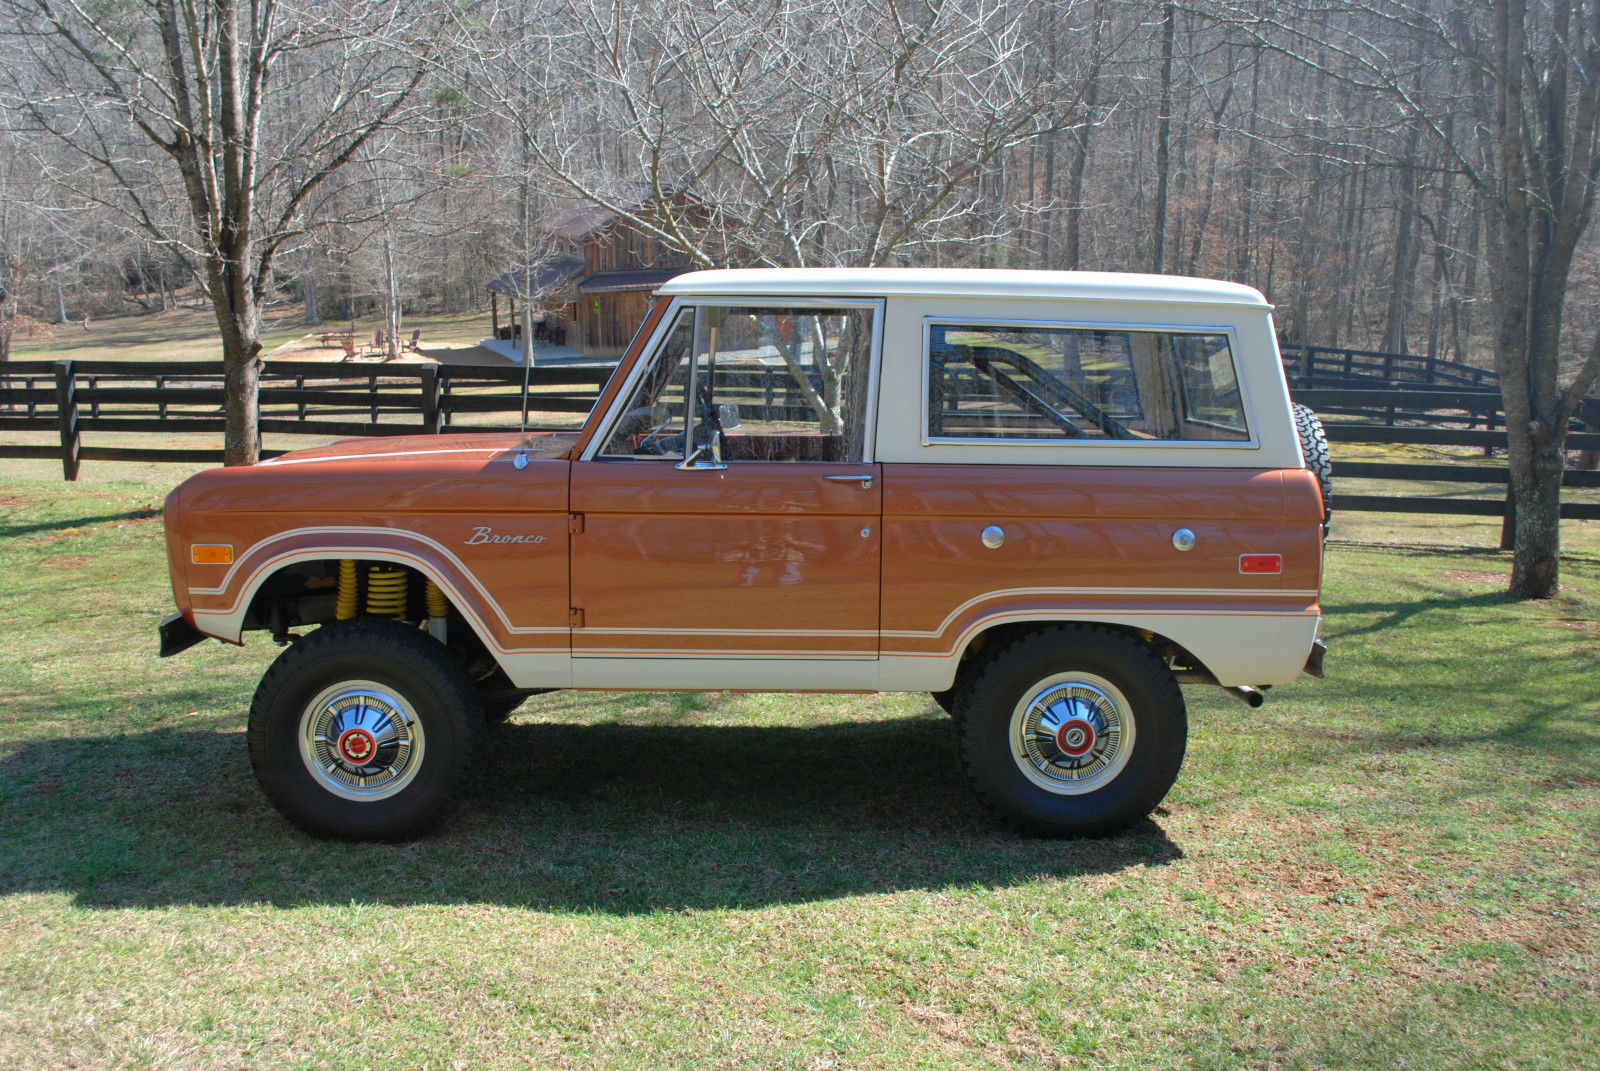 Photo 1974 Ford Bronco Ranger,83k original miles